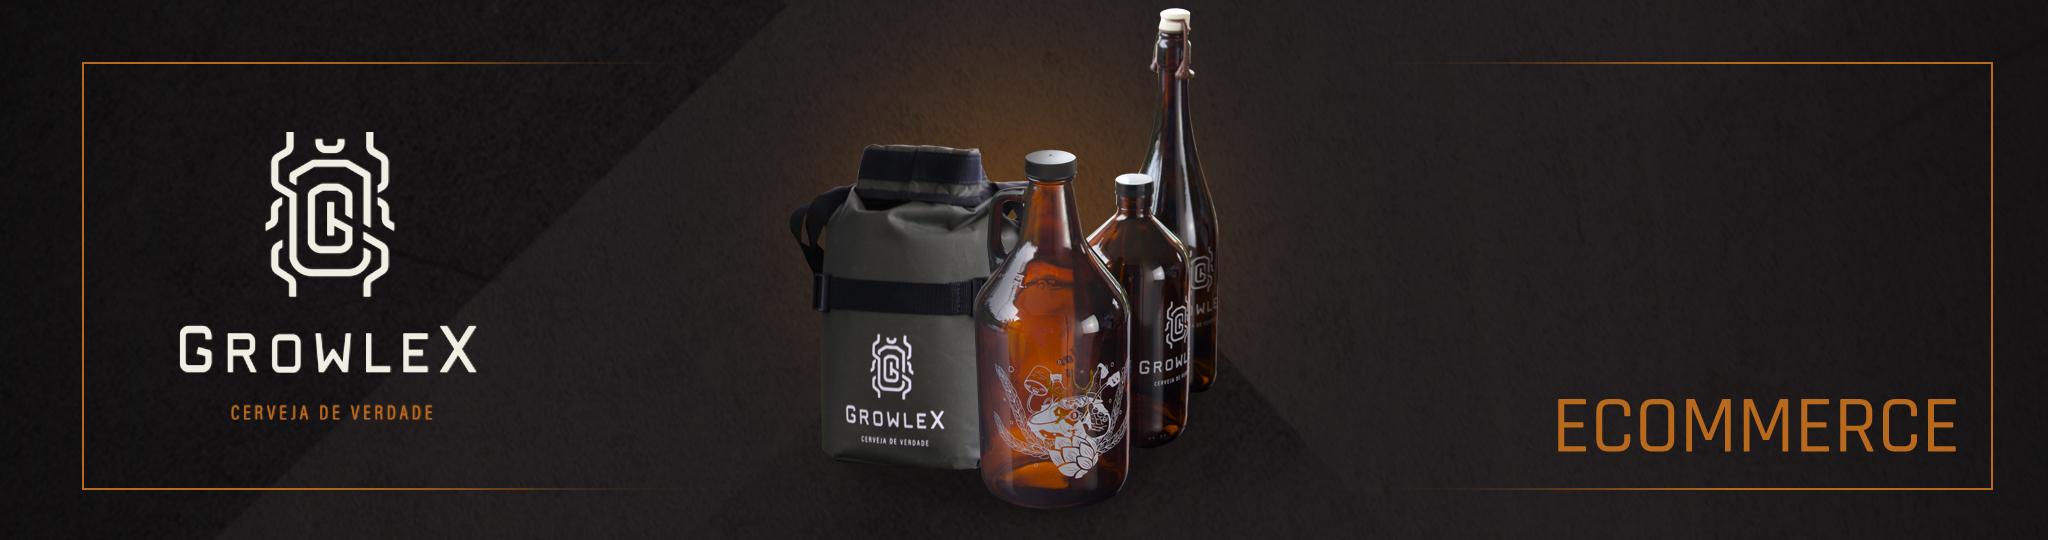 Growlex